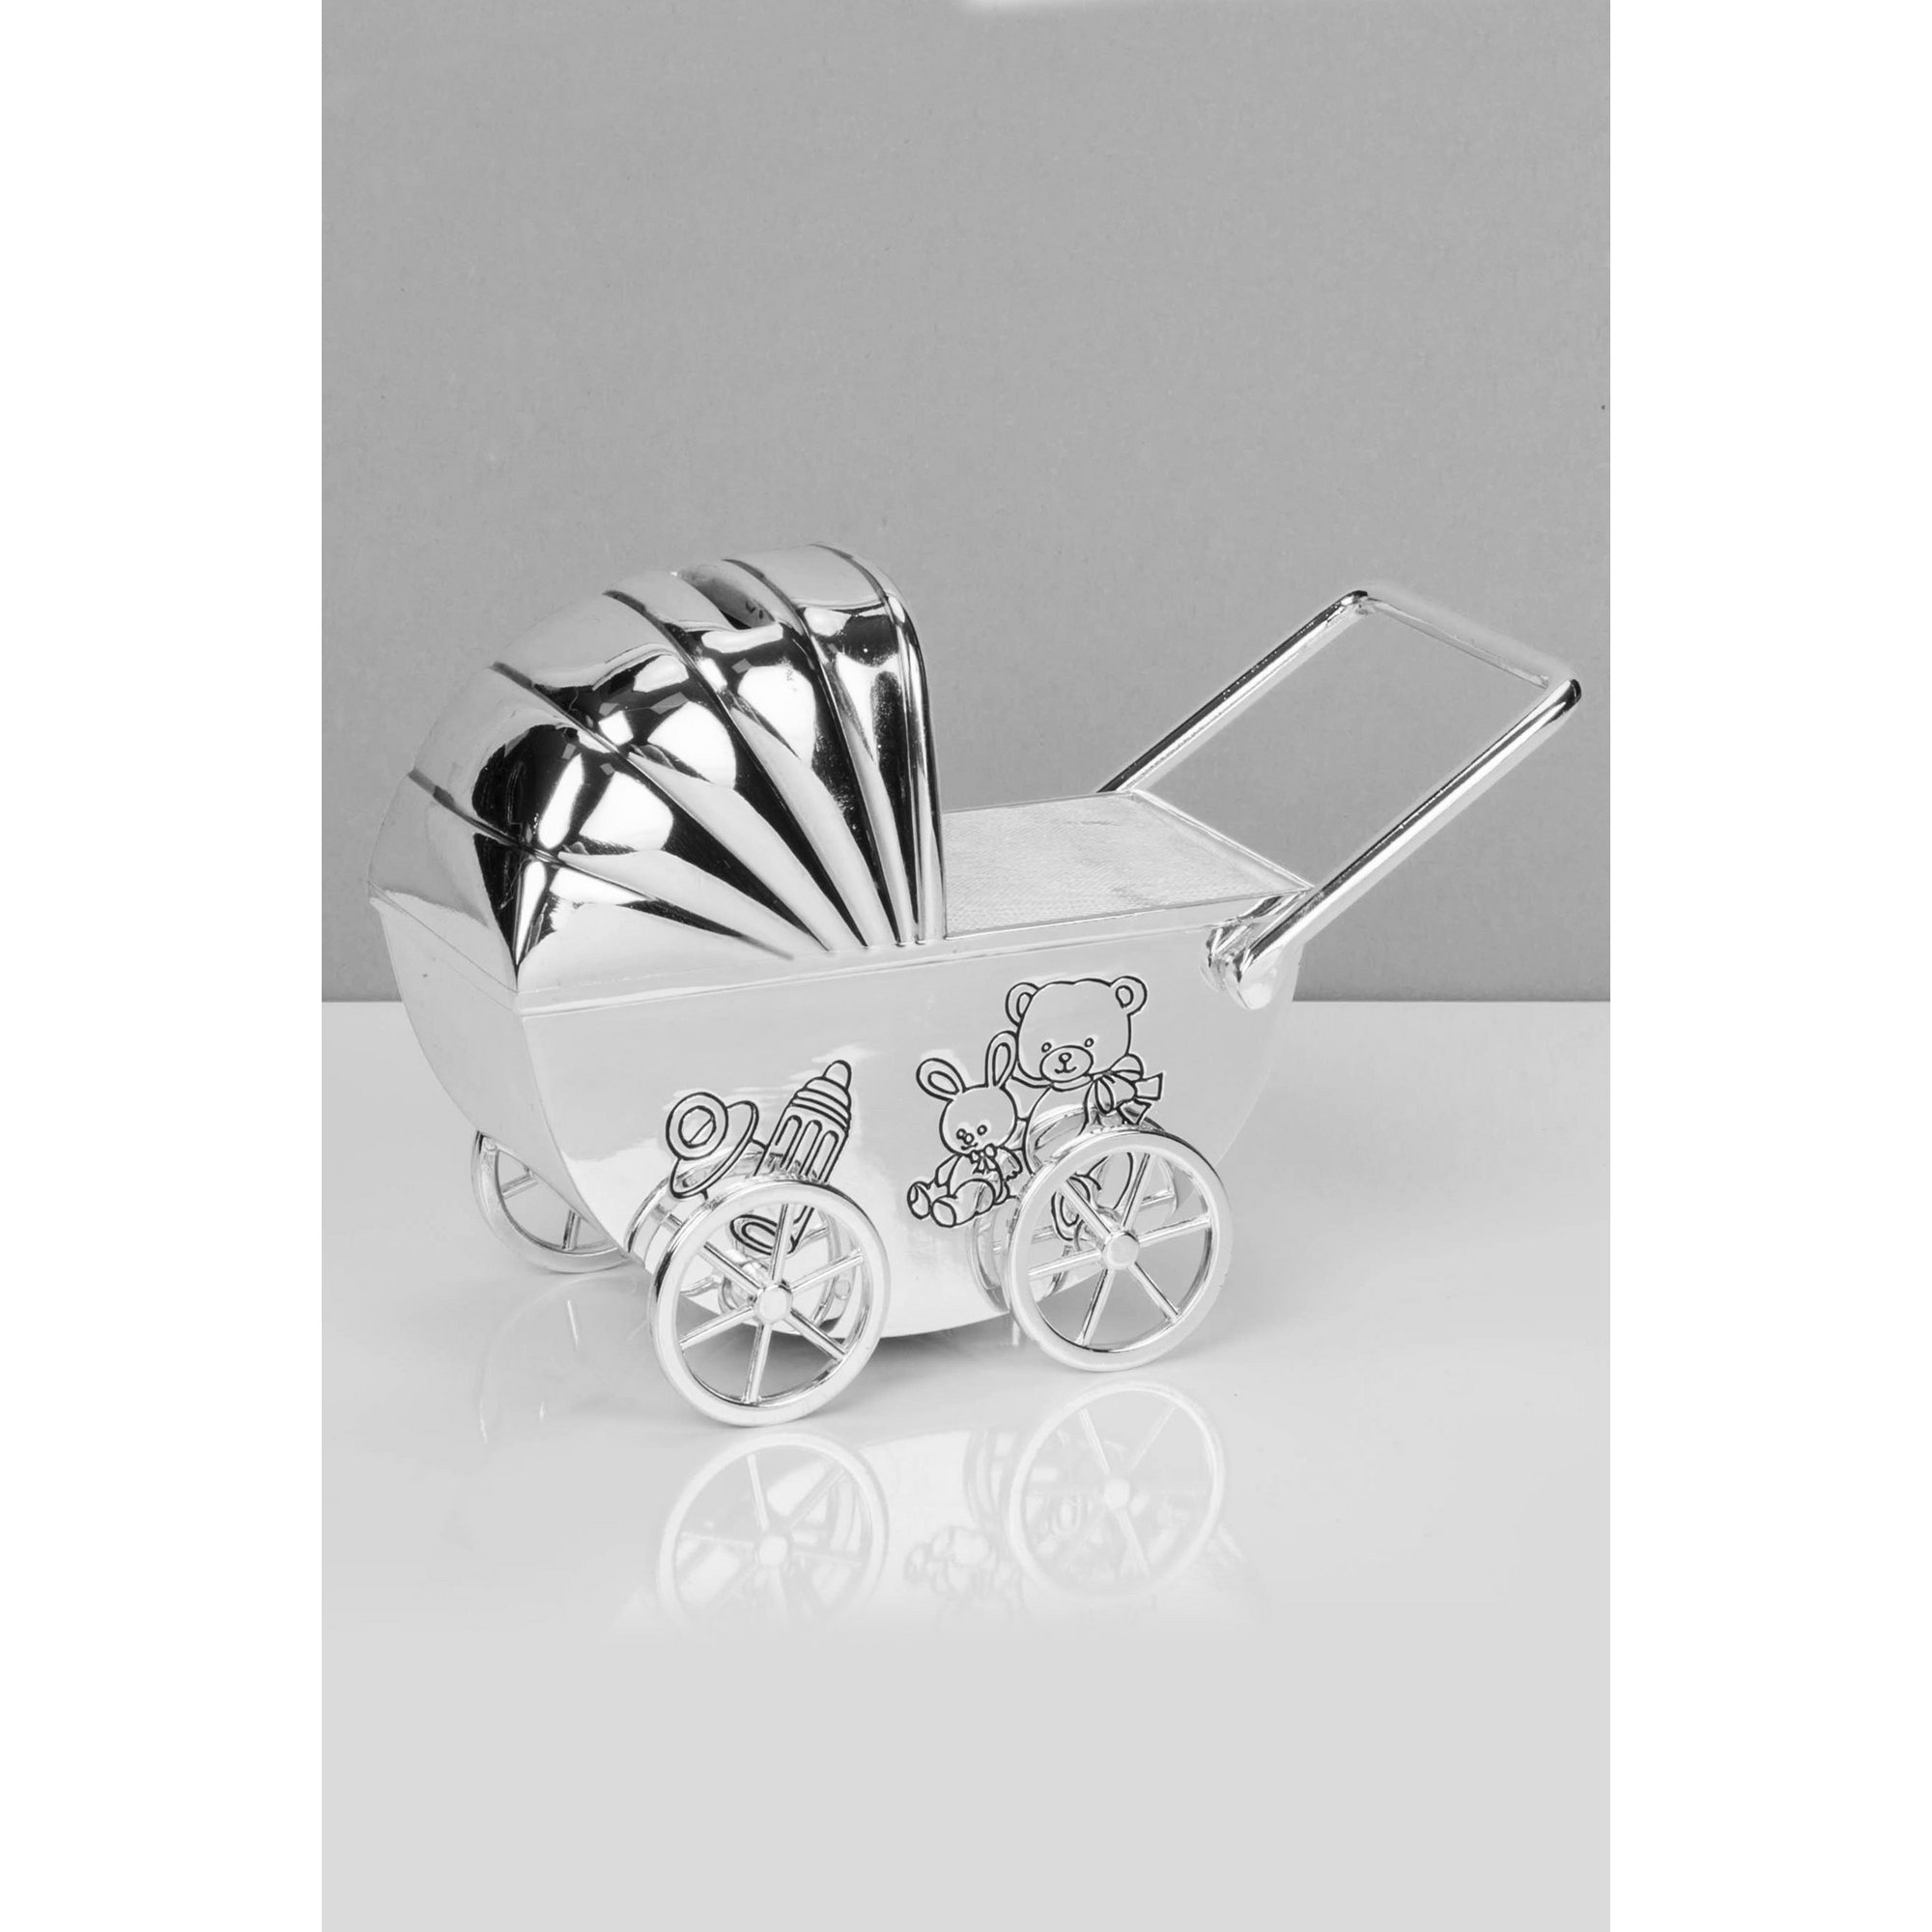 Image of Bambino Silver Plated Pram Money Box